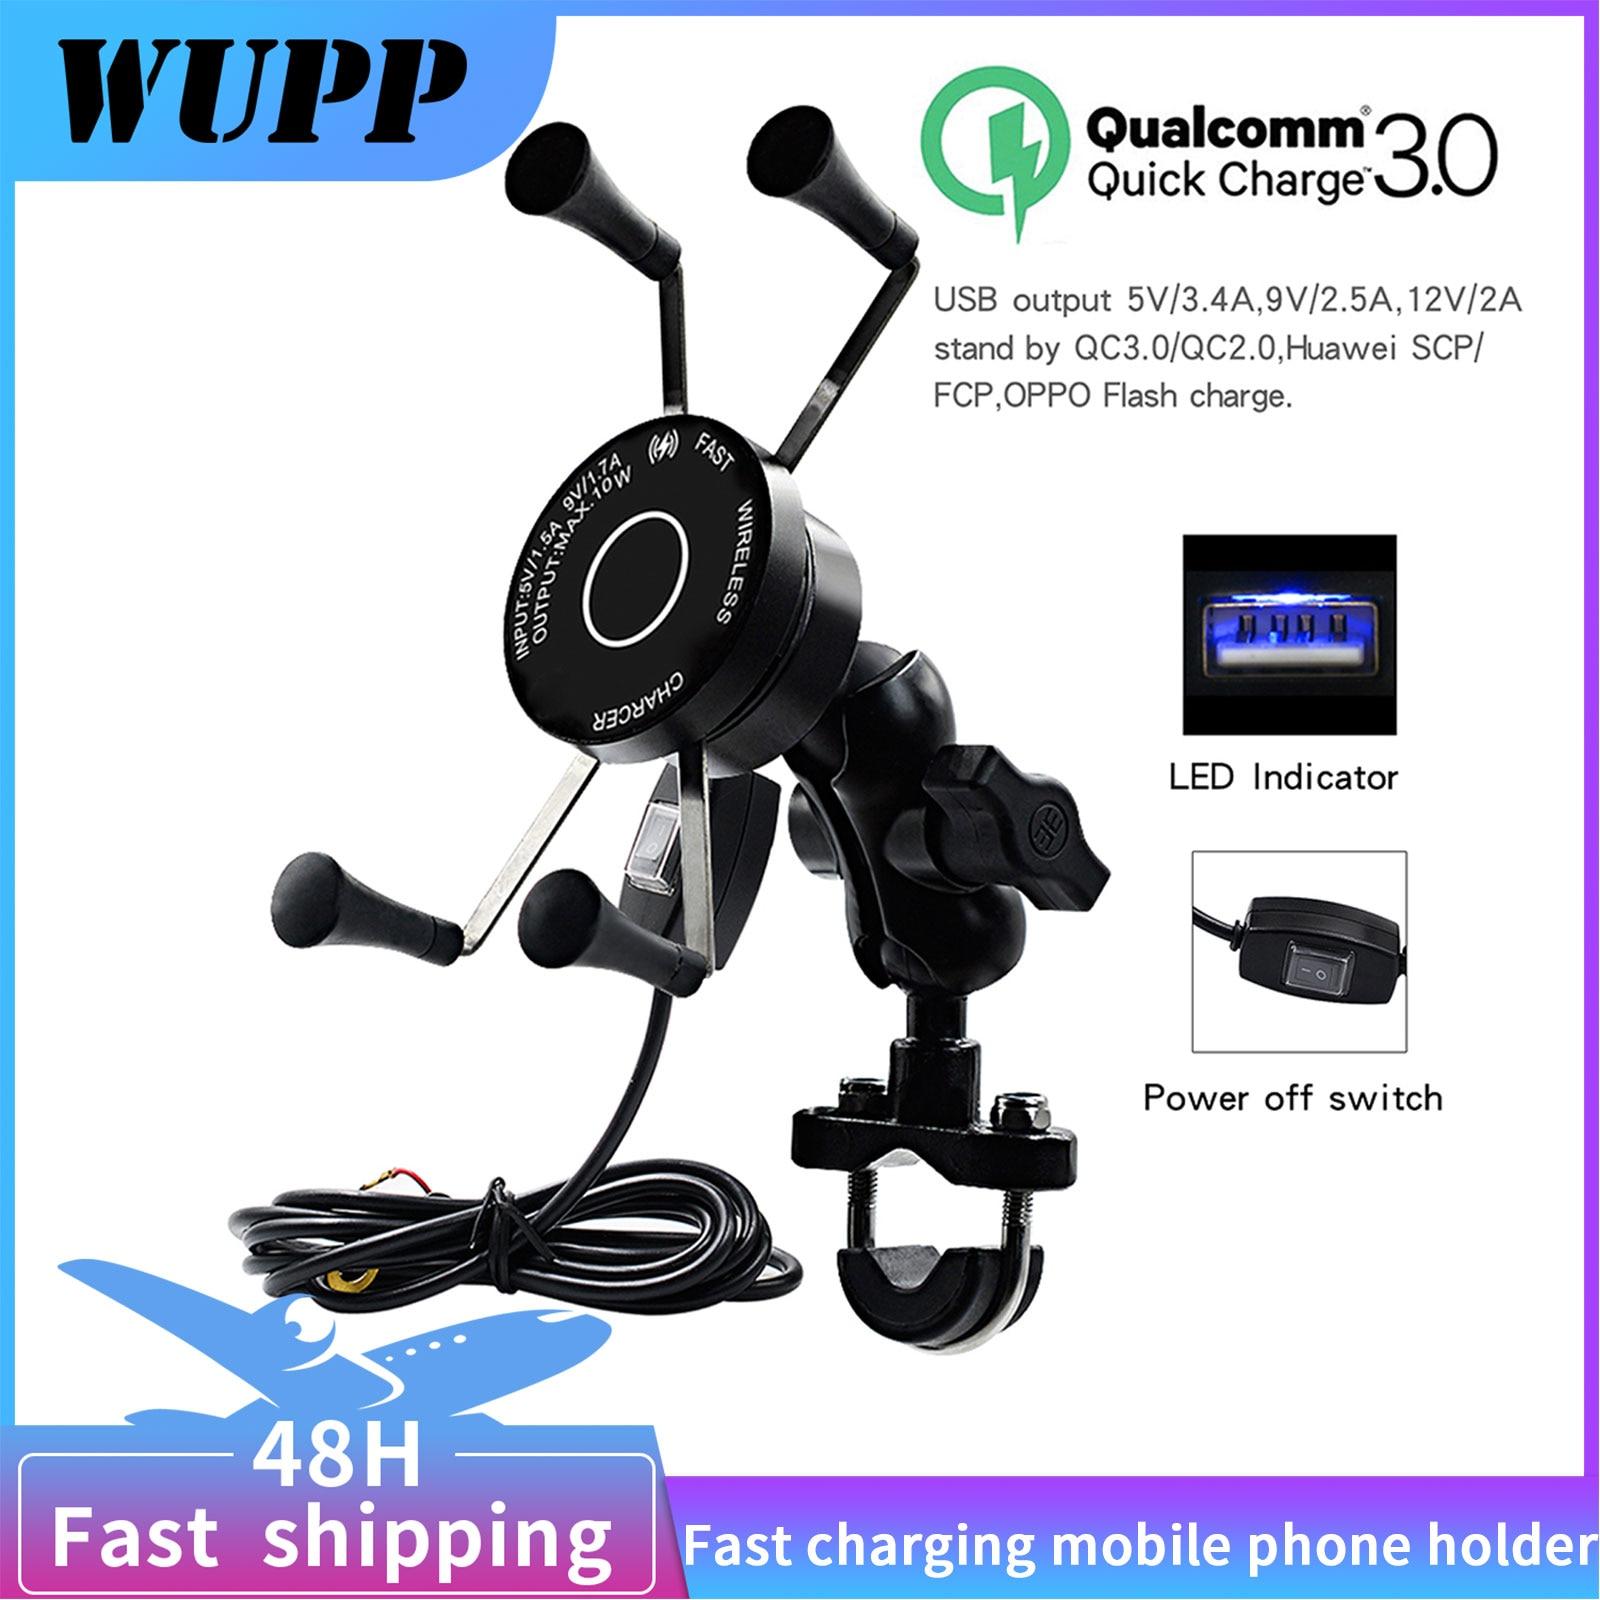 WUPP أصيلة دراجة نارية قوس السلكية اللاسلكية اثنين في واحد USB QC3.0 تهمة سريعة مقاوم للماء سبائك الألومنيوم موتو حامل هاتف